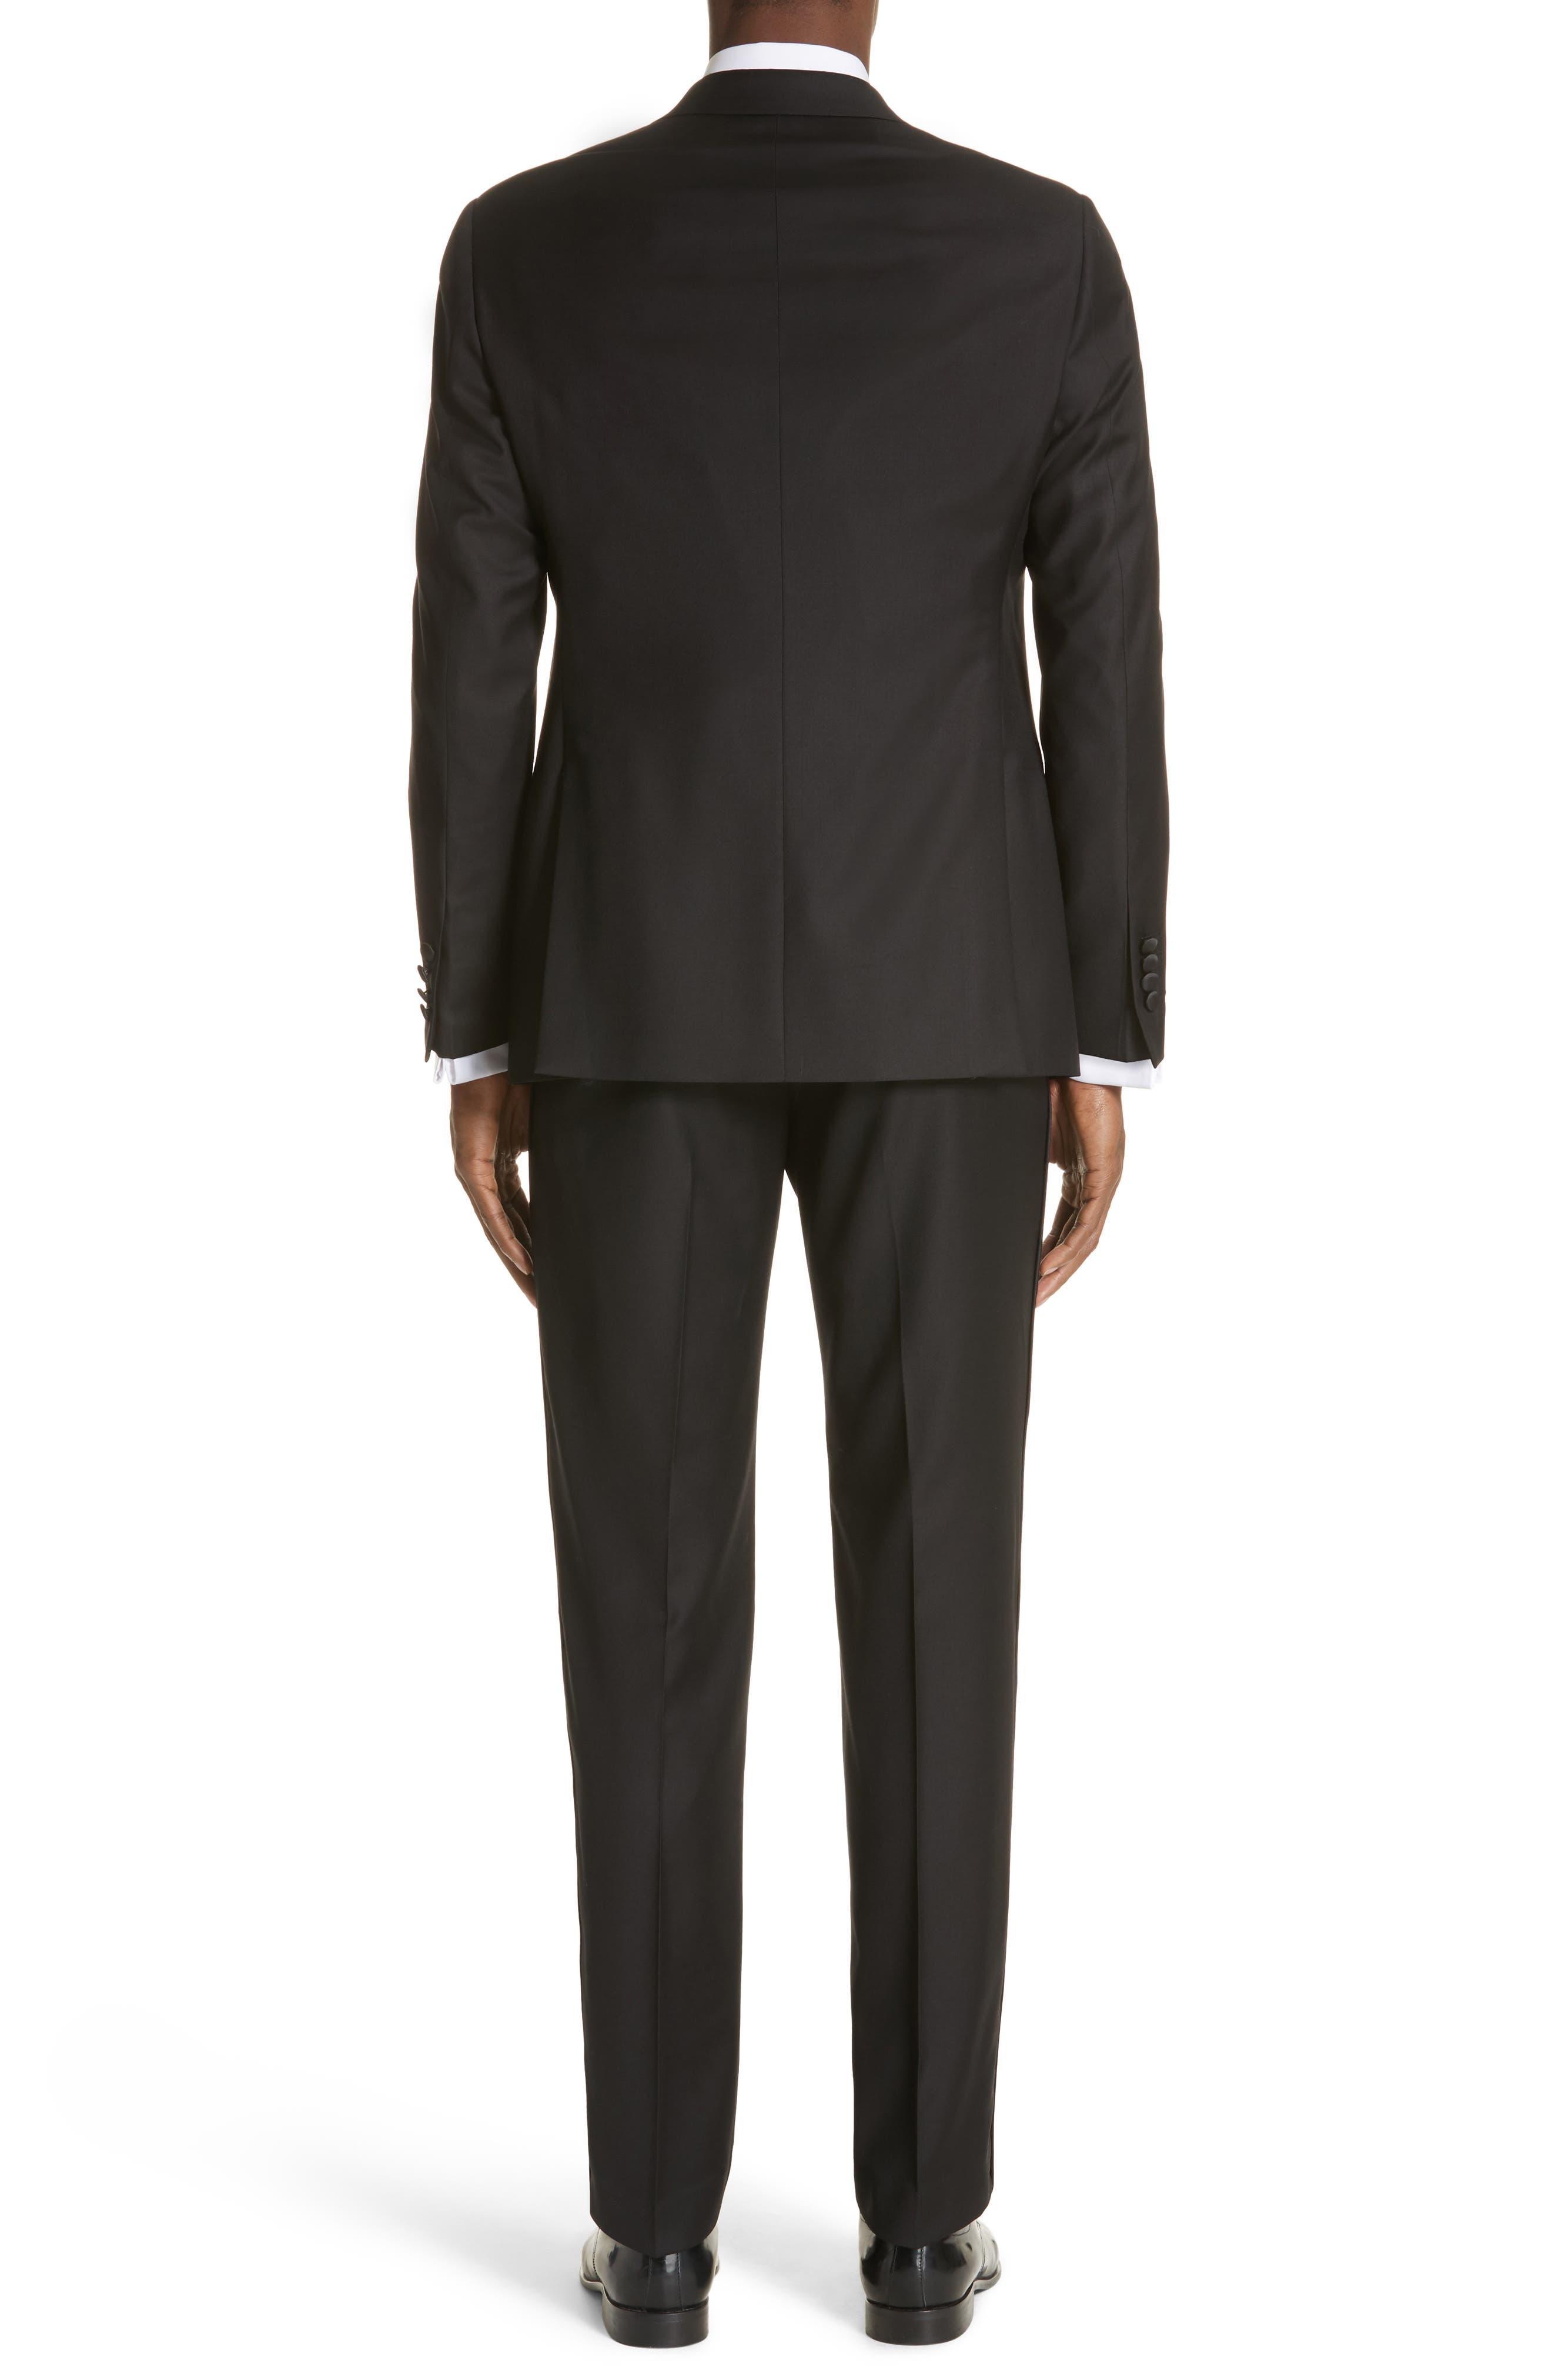 EMPORIO ARMANI, Trim Fit Wool Tuxedo, Alternate thumbnail 2, color, BLACK